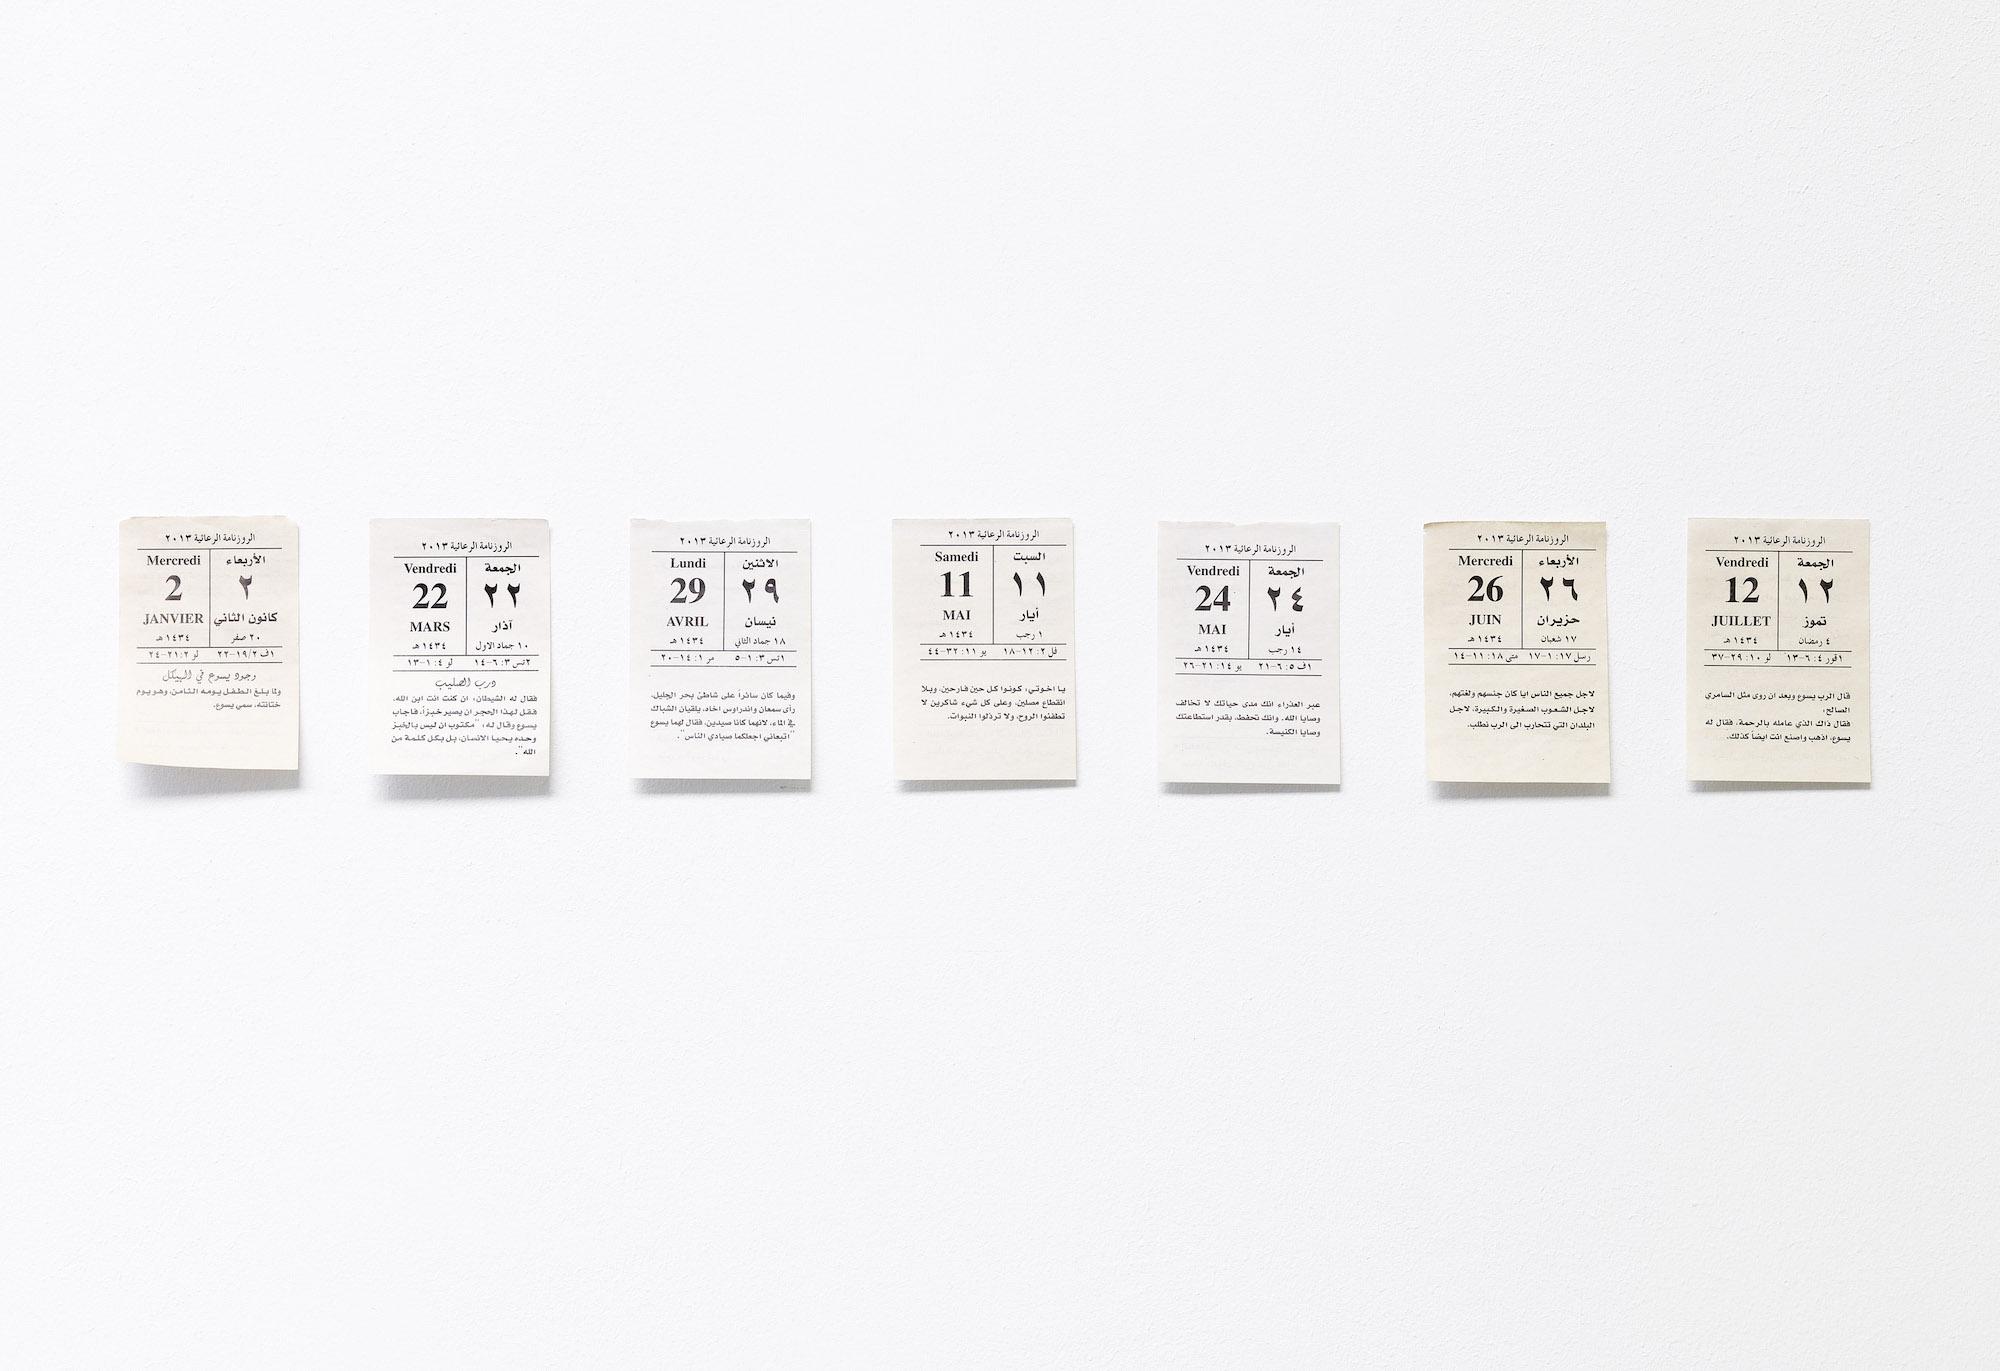 Charbel-joseph H. Boutros  Days under their own sun 2015 Lebanese calendar sheets, sun of Beirut, Bikfaya, Maastricht, Paris, São Paulo 10 x 7 cm